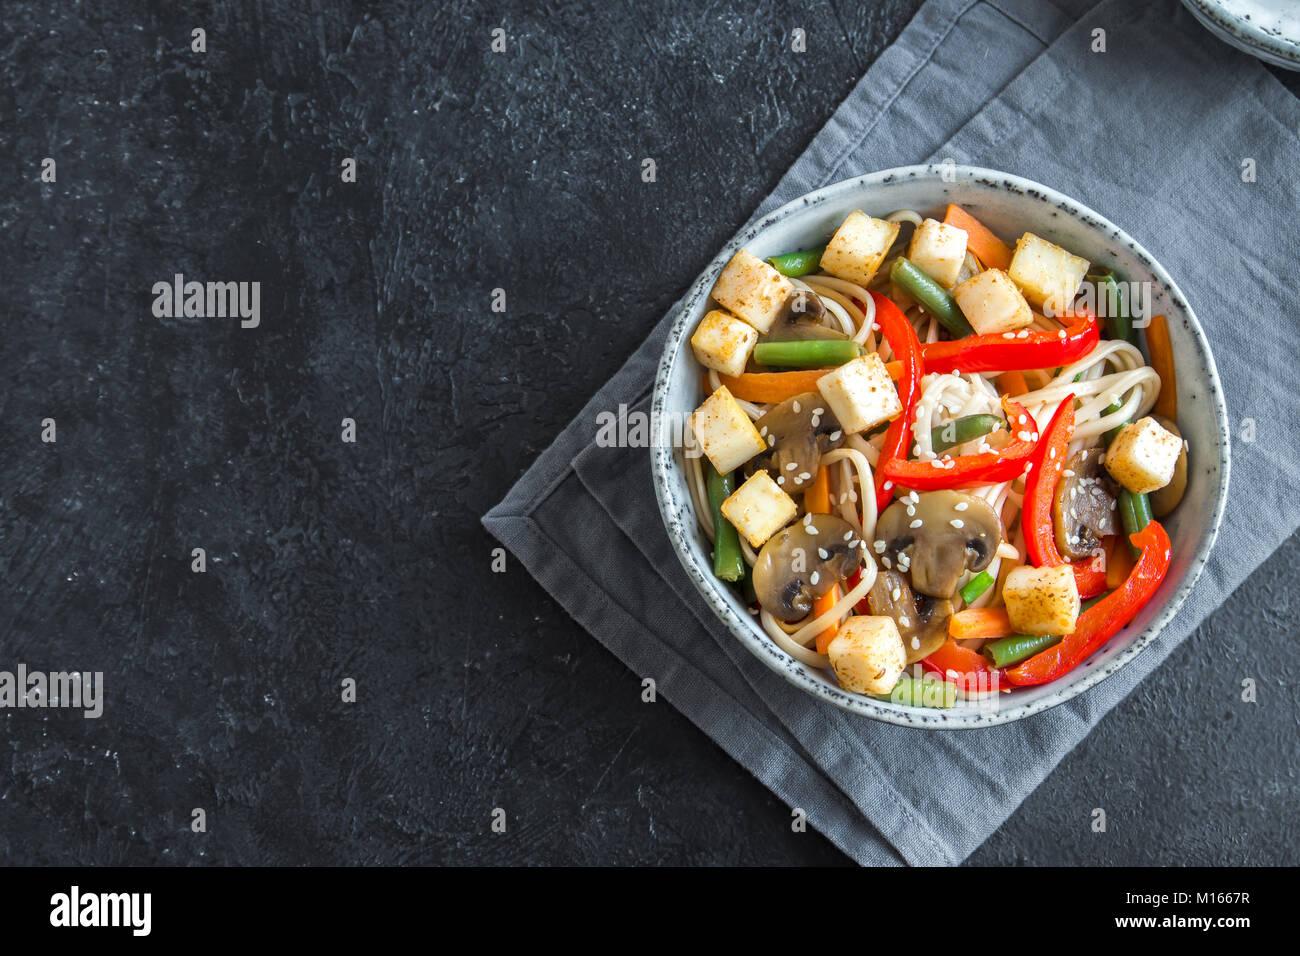 Stir fry with udon noodles, tofu, mushrooms and vegetables. Asian vegan vegetarian food, meal, stir fry over black - Stock Image